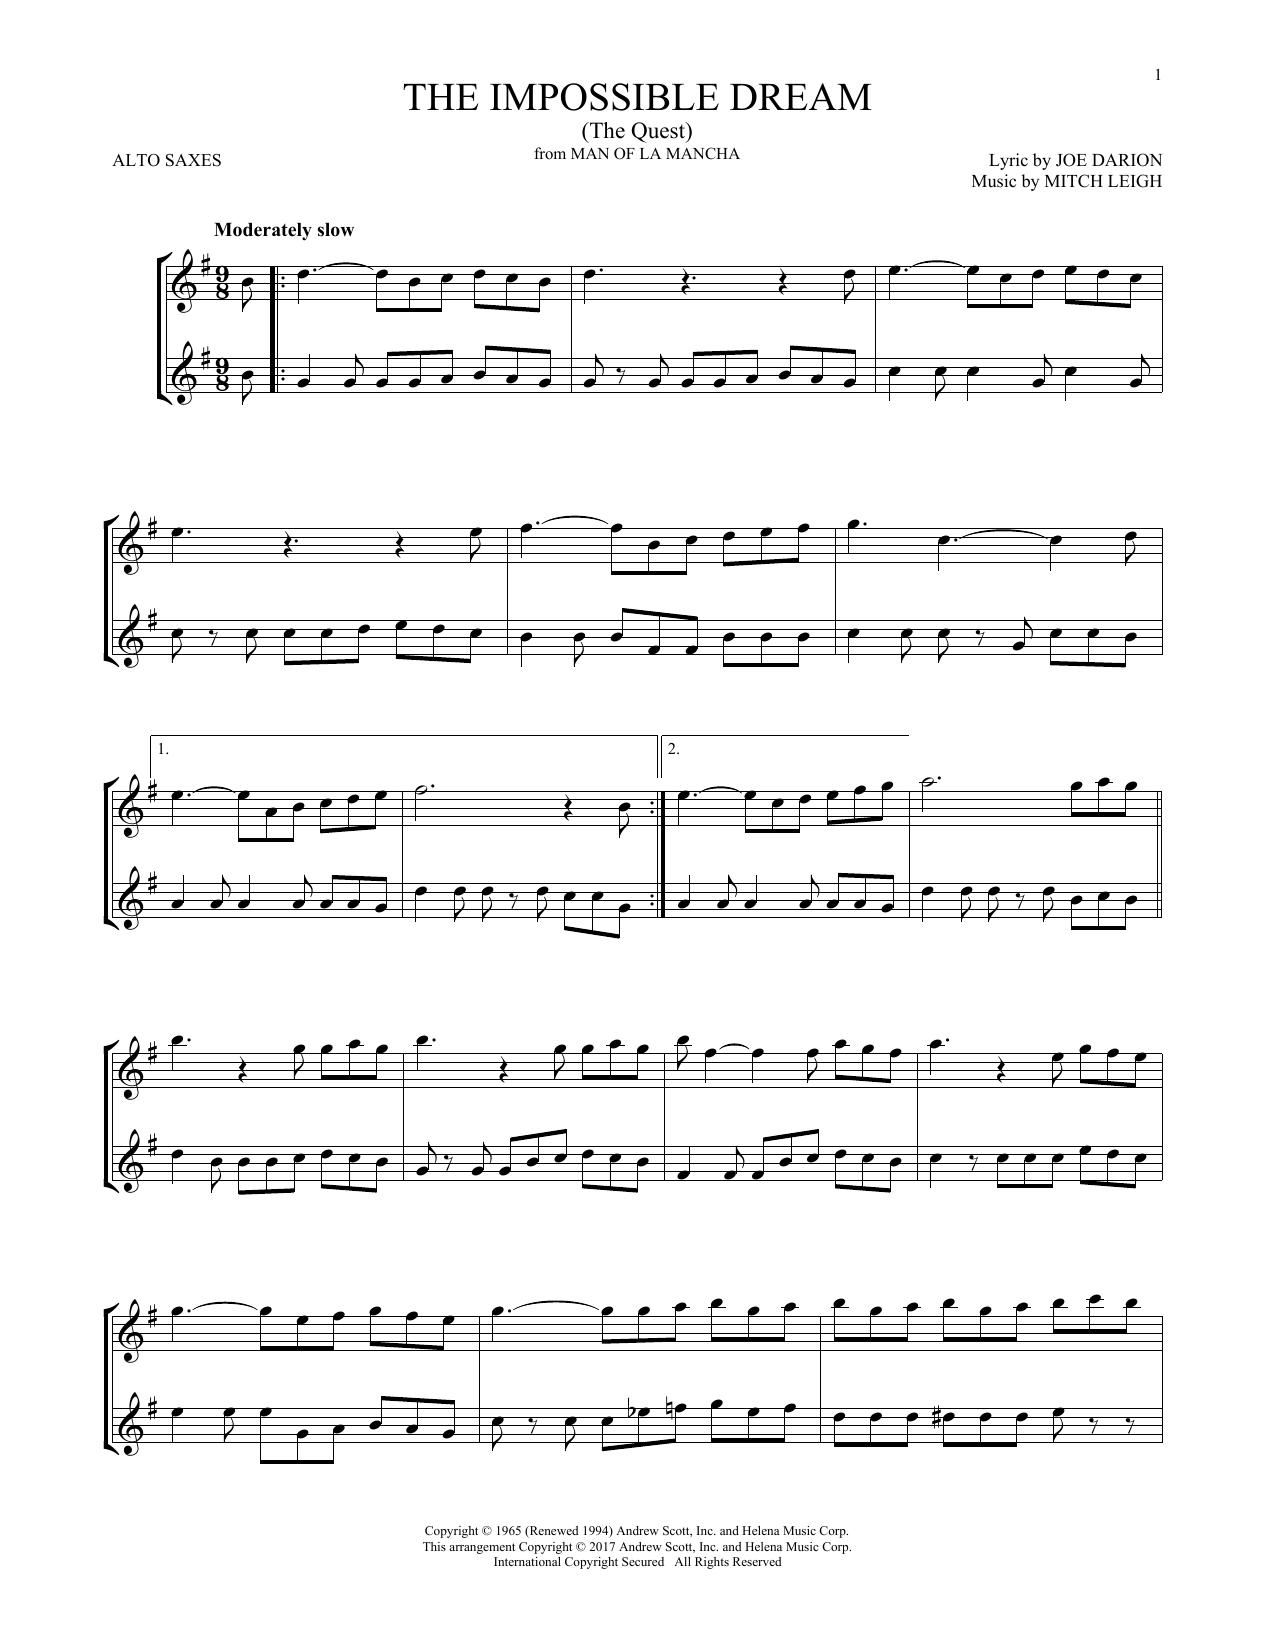 The Impossible Dream (The Quest) (Alto Sax Duet)